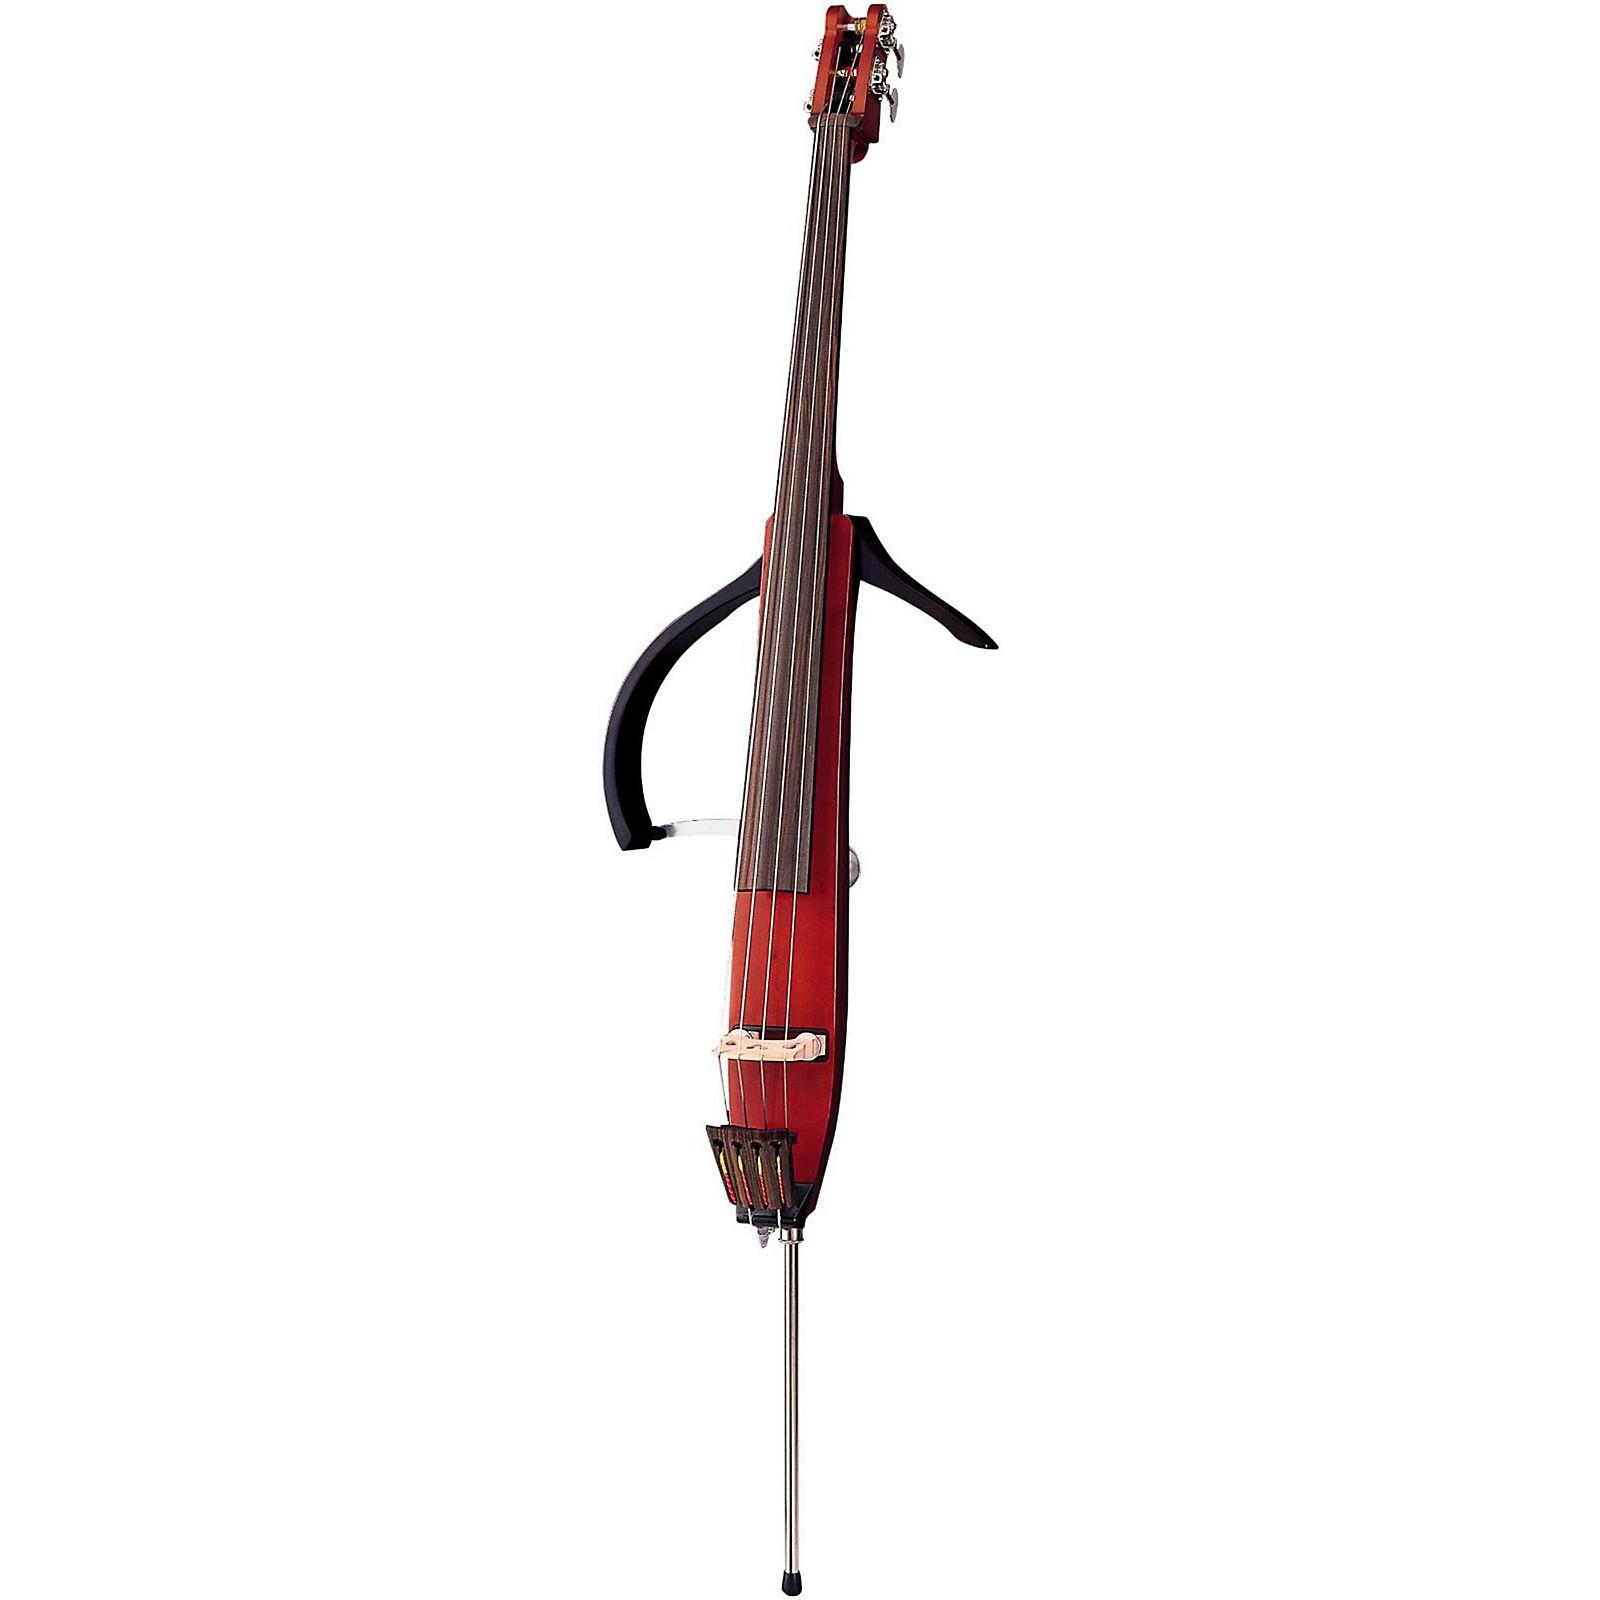 Yamaha SVB-200SK Silent Upright Bass